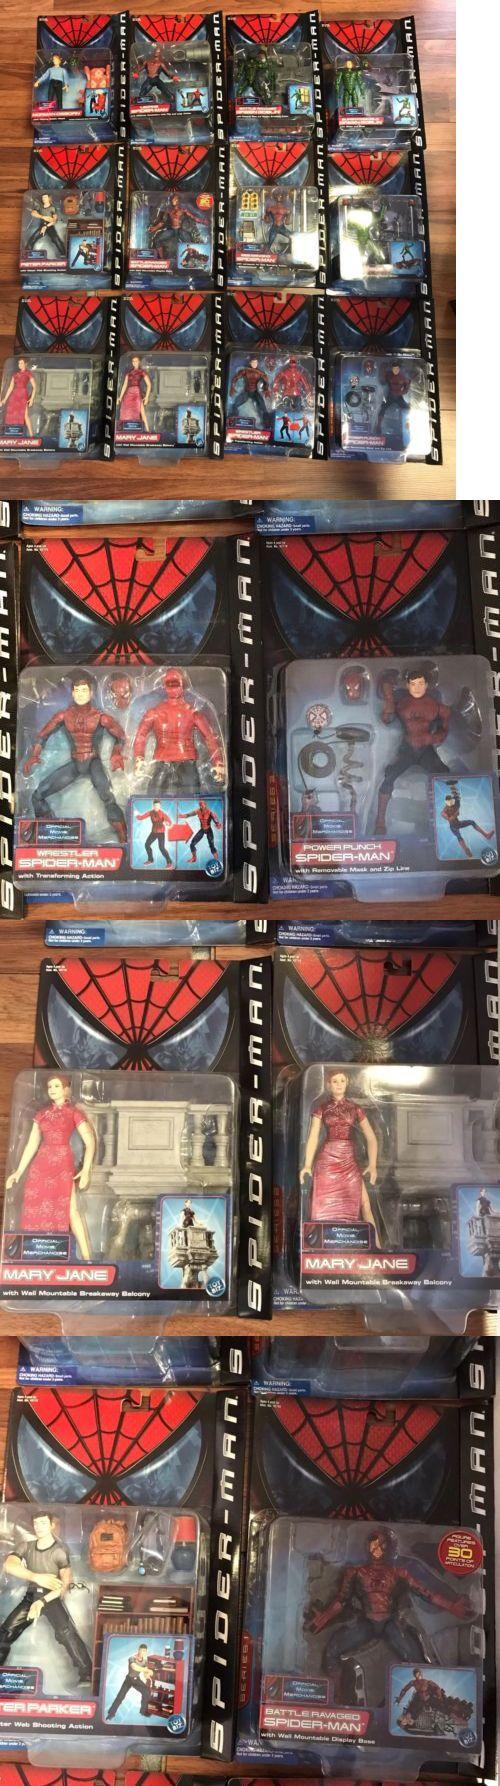 Comic Book Heroes 158671: 2002 Toybiz Spider-Man Movie Wrestler Spiderman 6 Marvel Legends Lot Of 12 Moc -> BUY IT NOW ONLY: $499.99 on eBay!